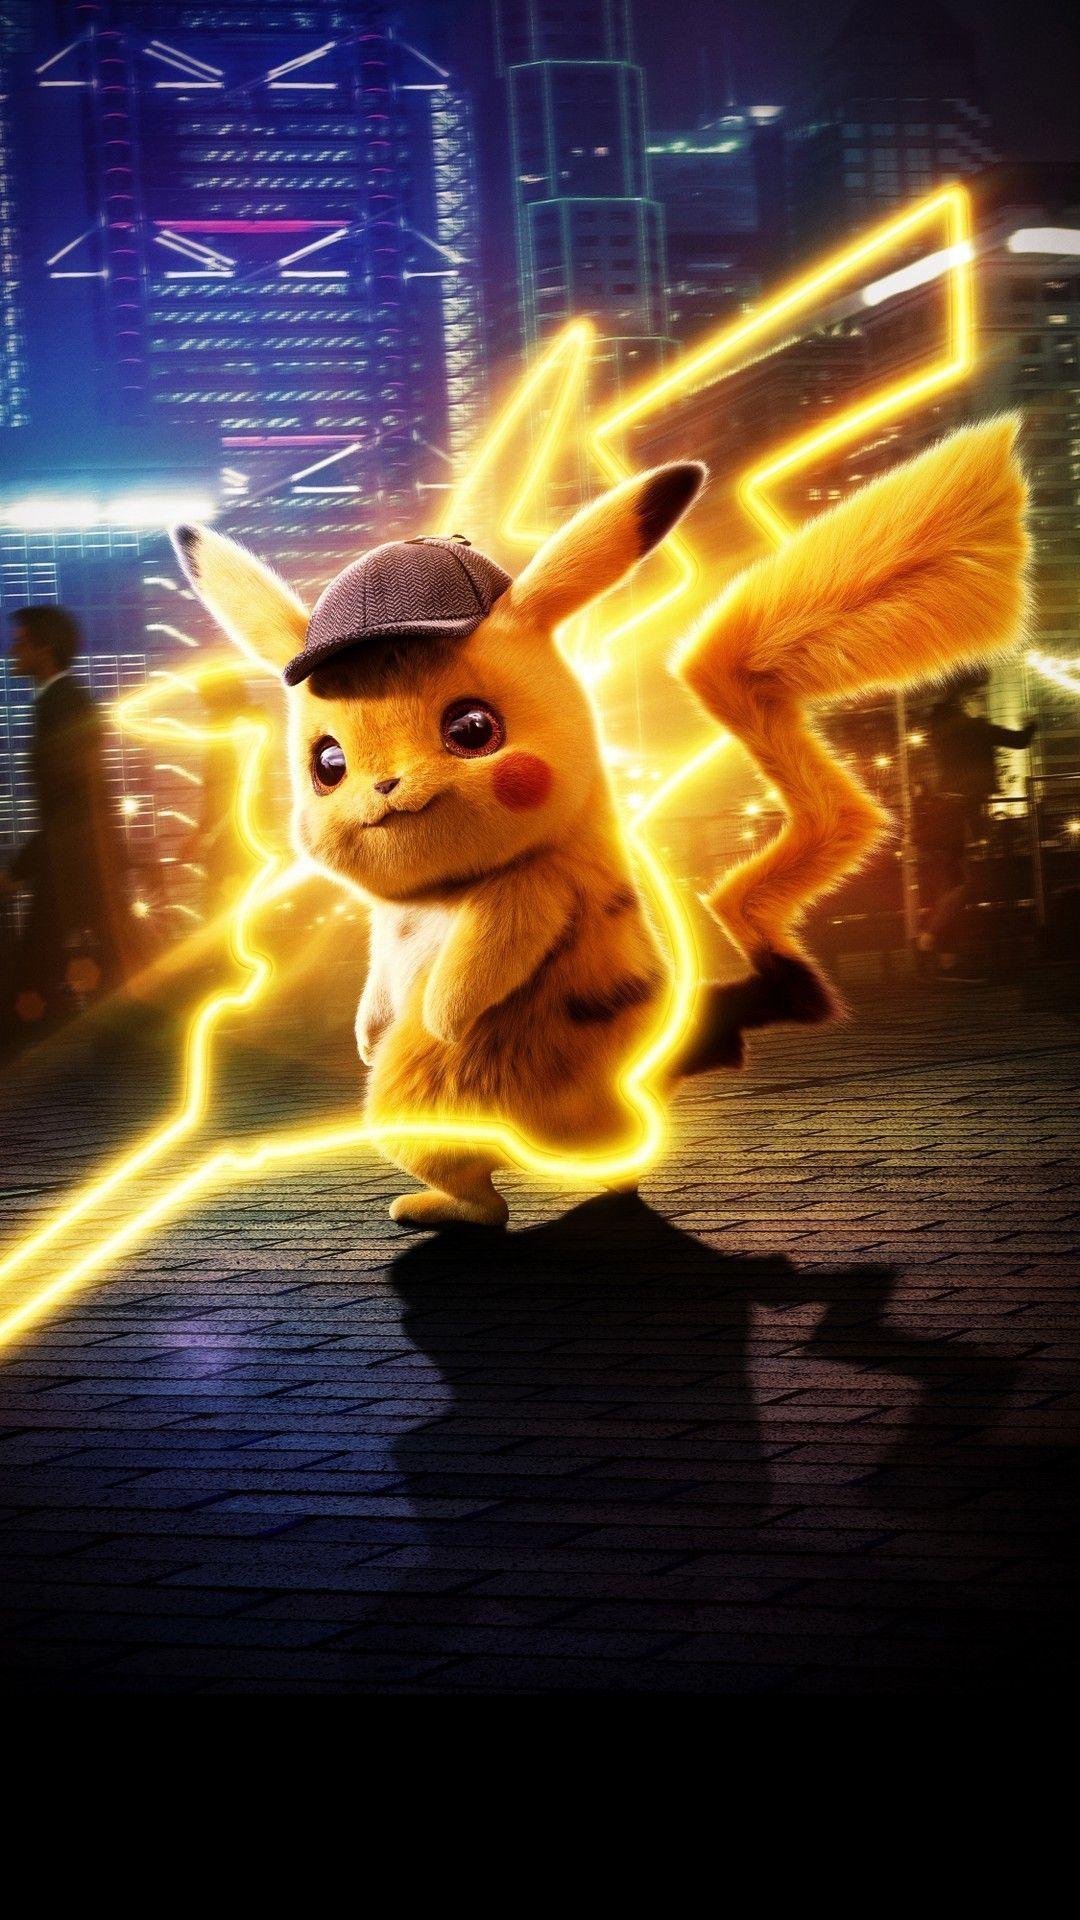 The Yellow Movie Wallpaper Home Screen Cinematics Wallpapers Ideas In 2020 Pikachu Art Pokemon Backgrounds Pikachu Wallpaper